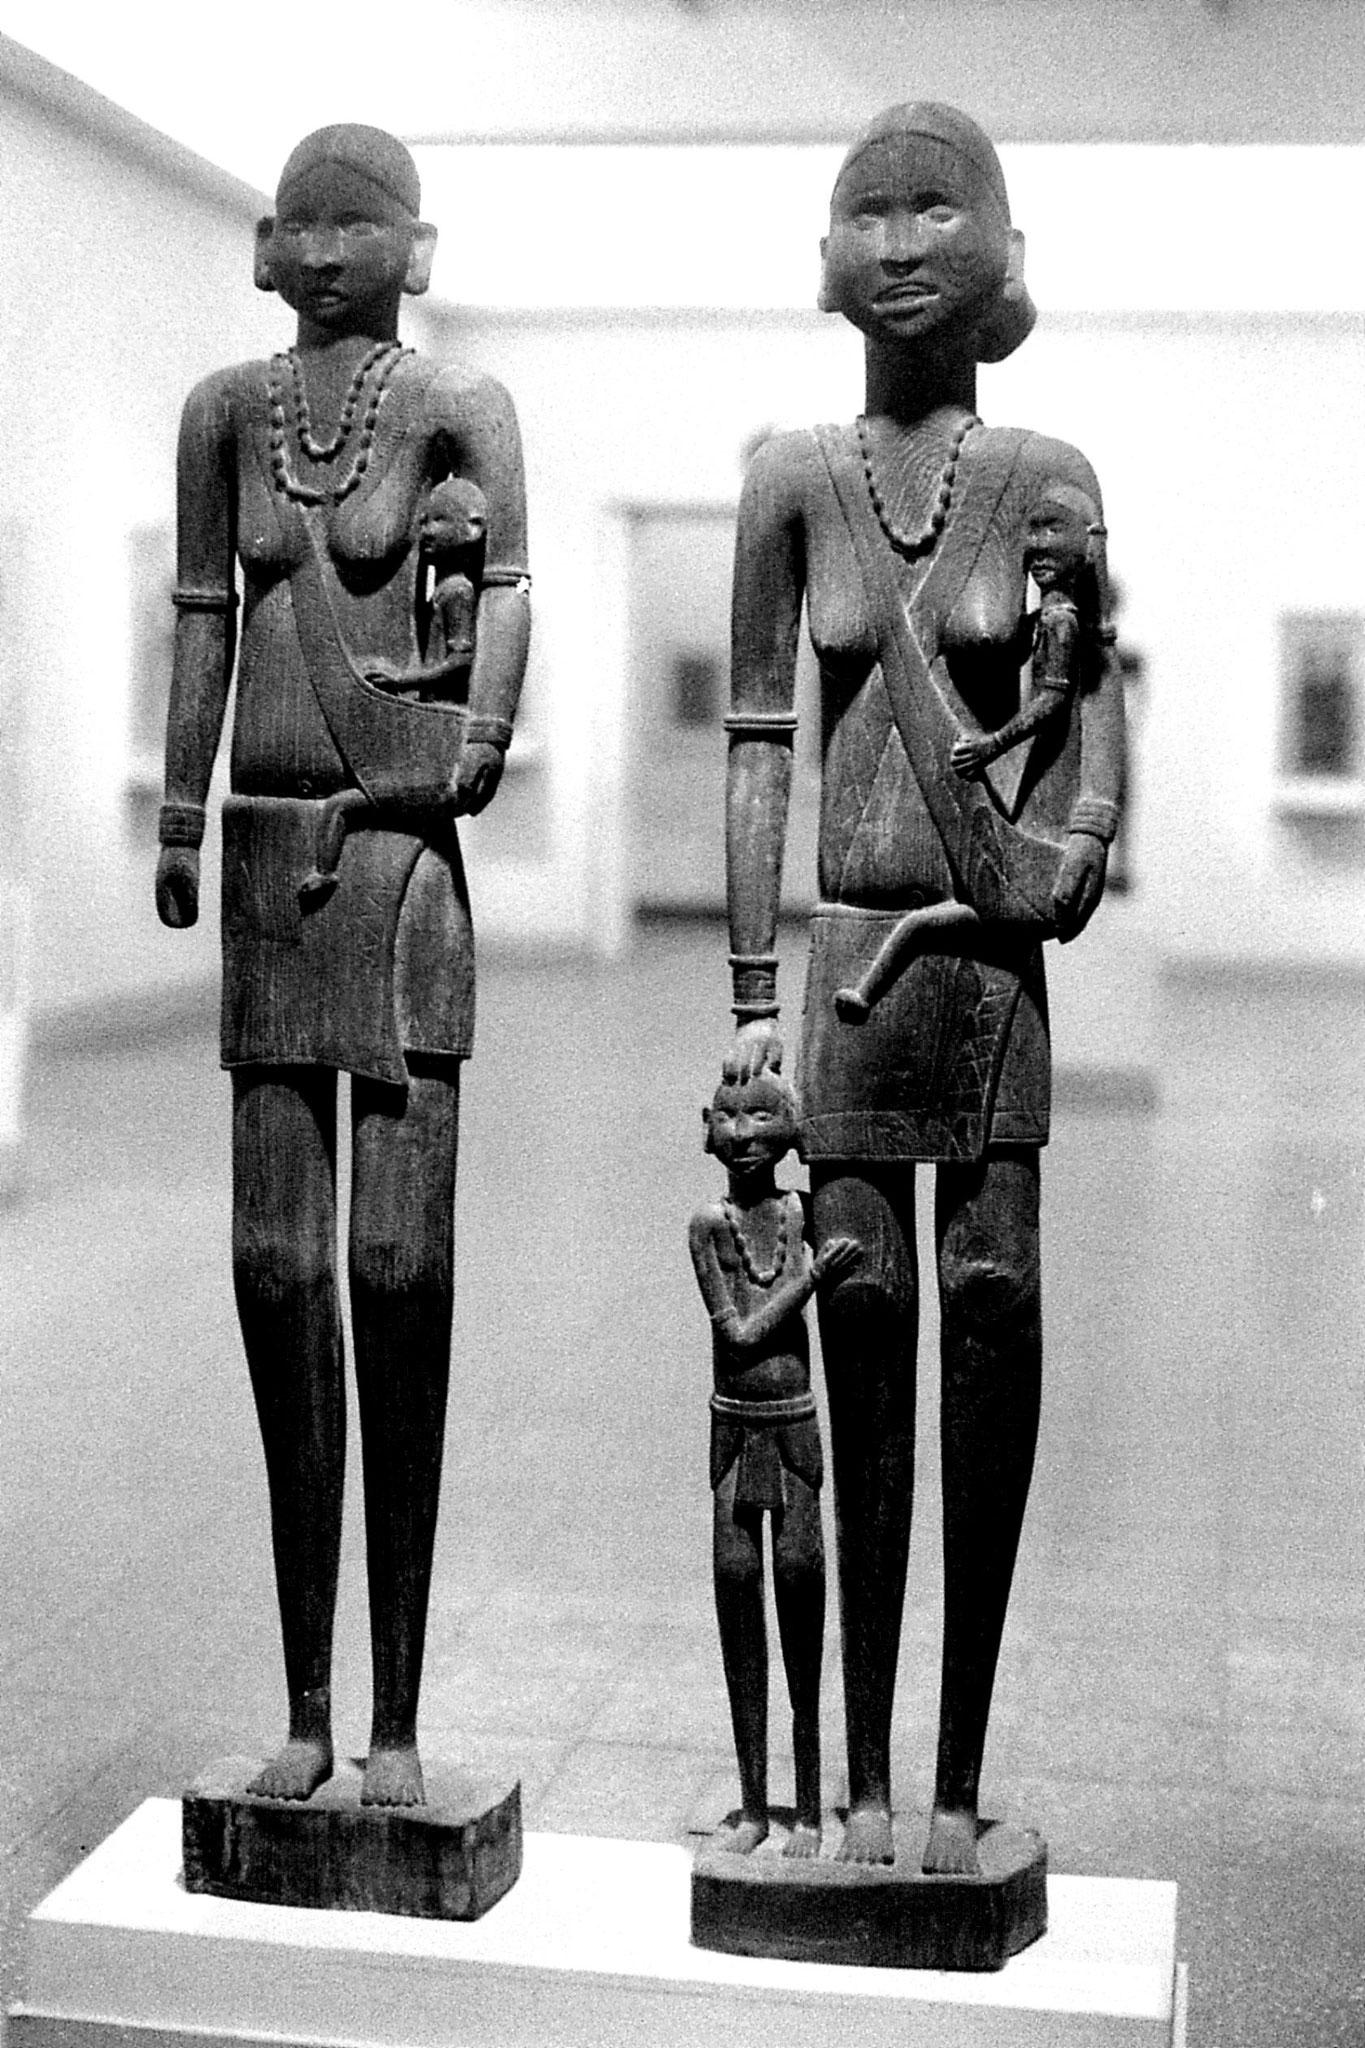 26/11/1989: 33: National Museum, Muria tribe